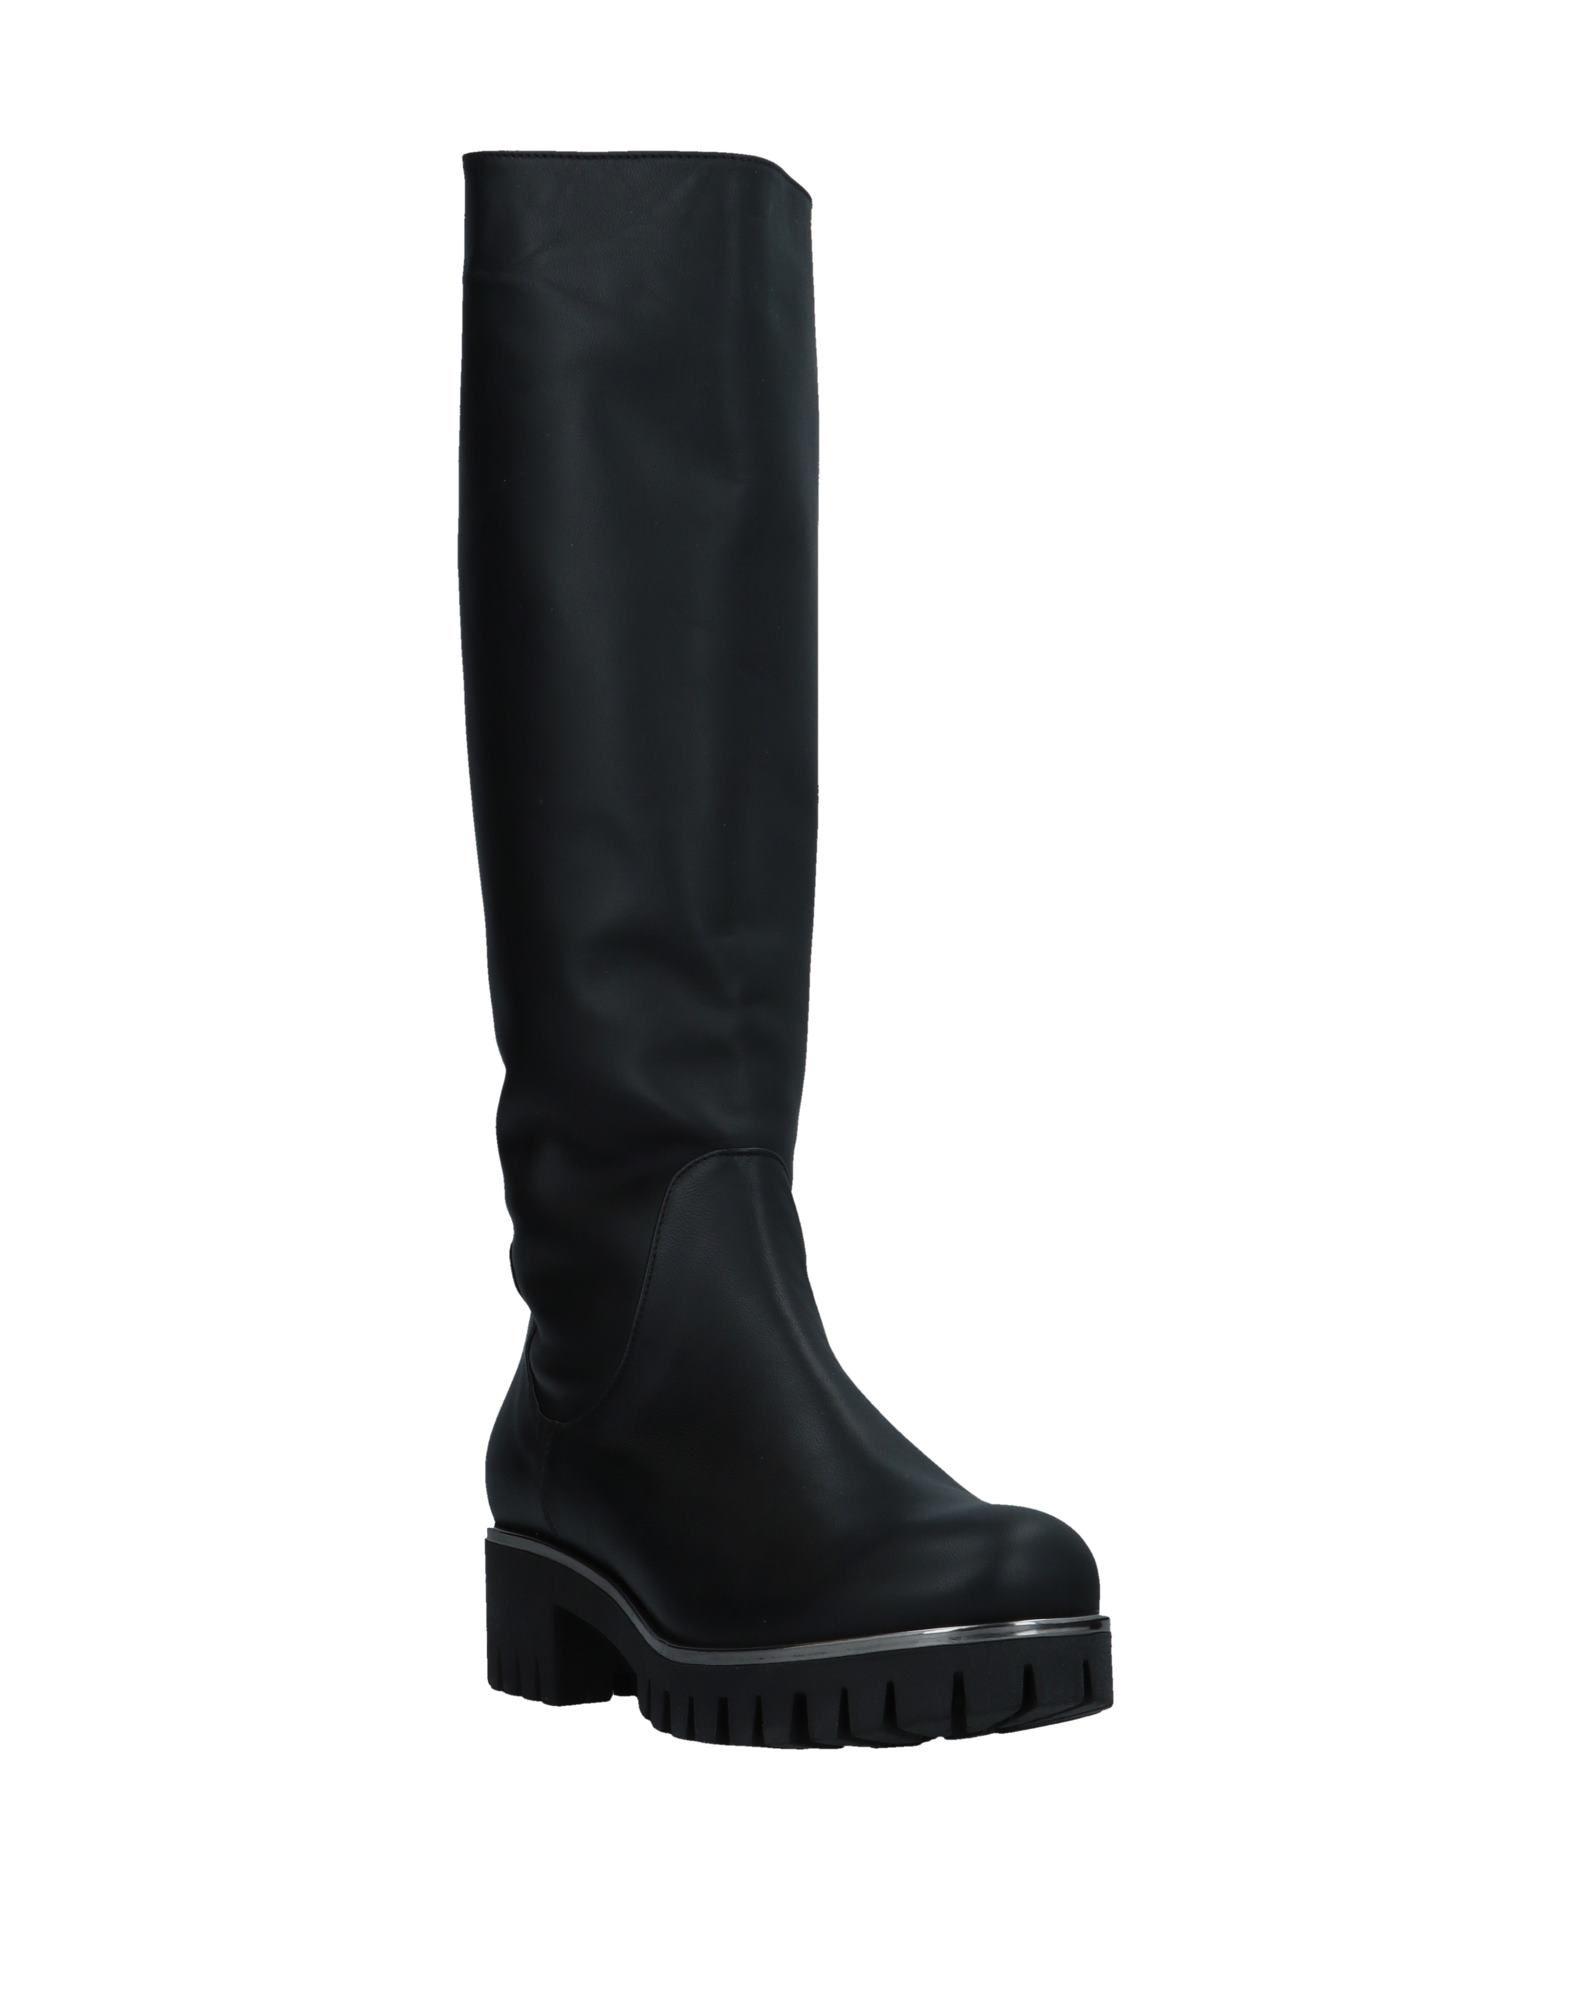 Verdecchia & Maniqua' Boots - Women online Verdecchia & Maniqua' Boots online Women on  United Kingdom - 11536469GW 36dc6c